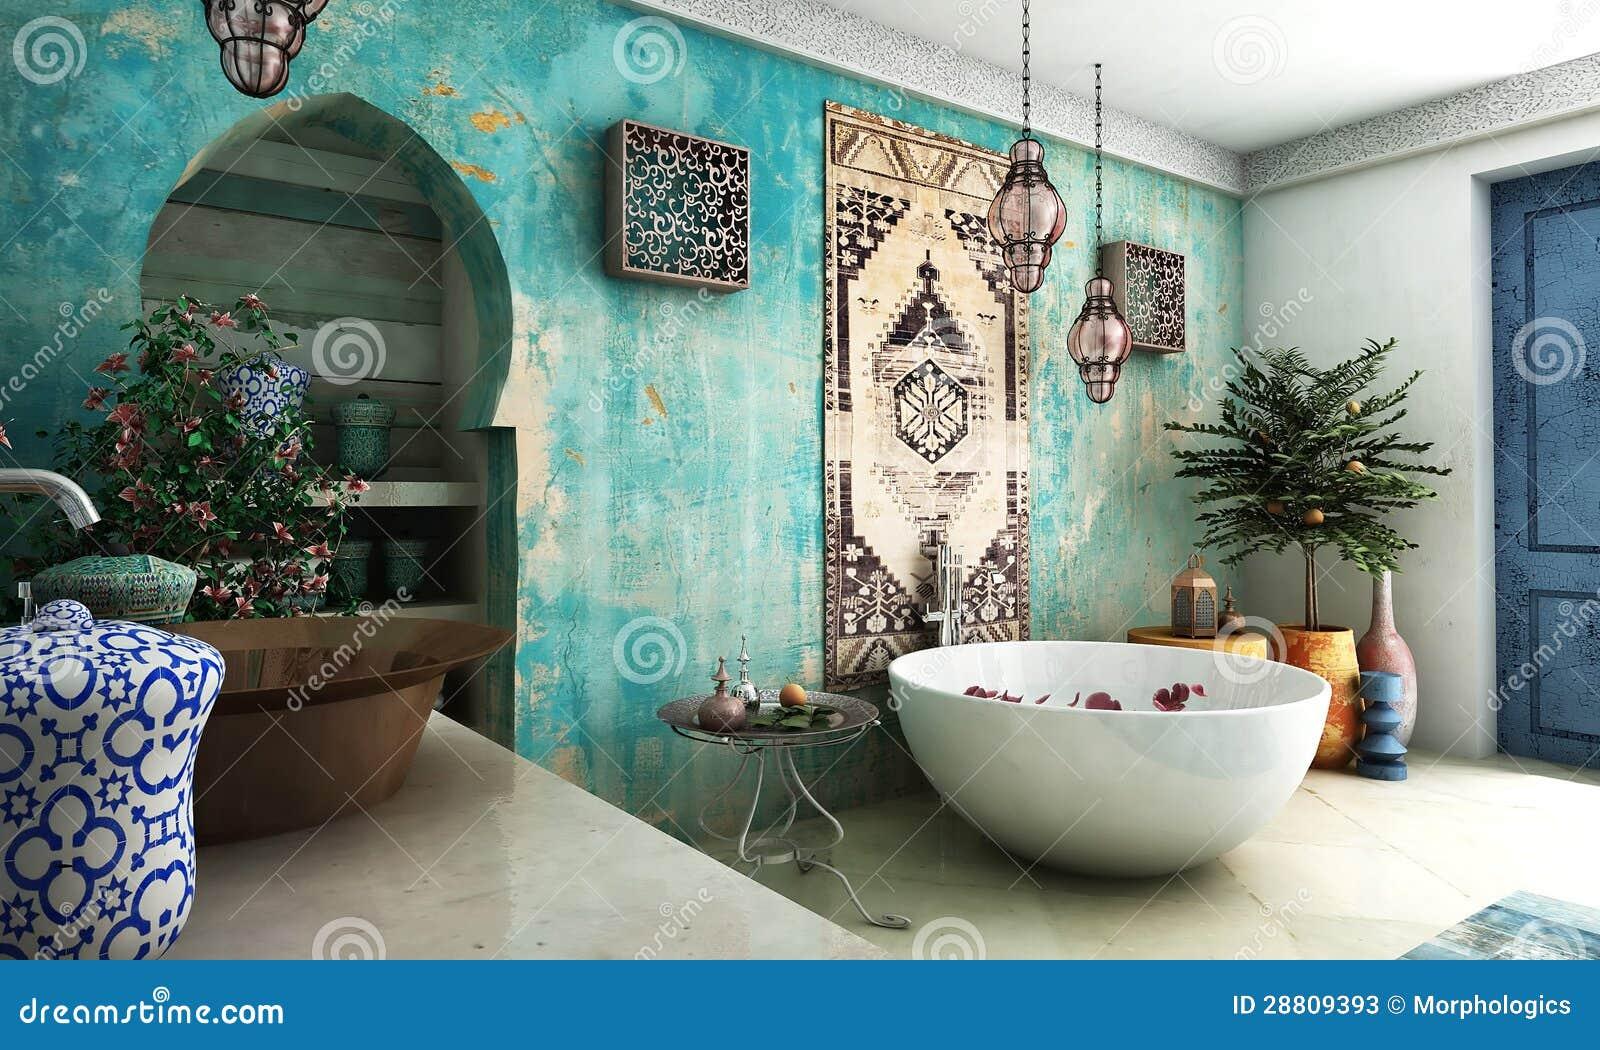 Salle De Bains Marocaine Photos stock - Image: 28809393